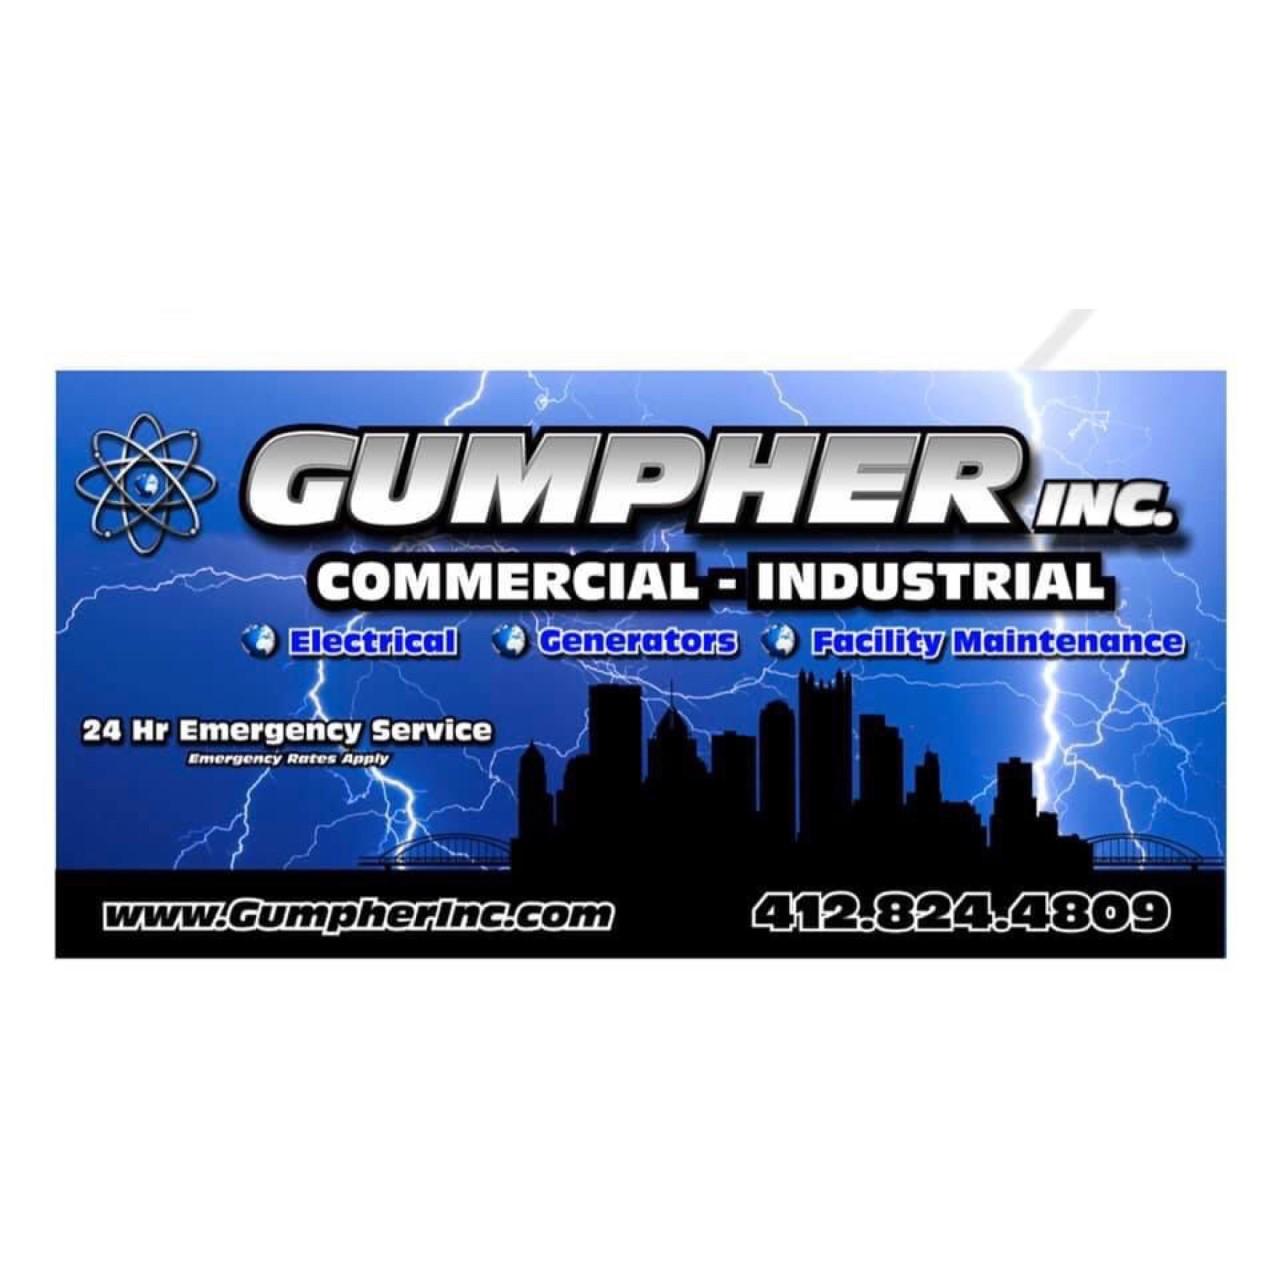 Gumpher Inc